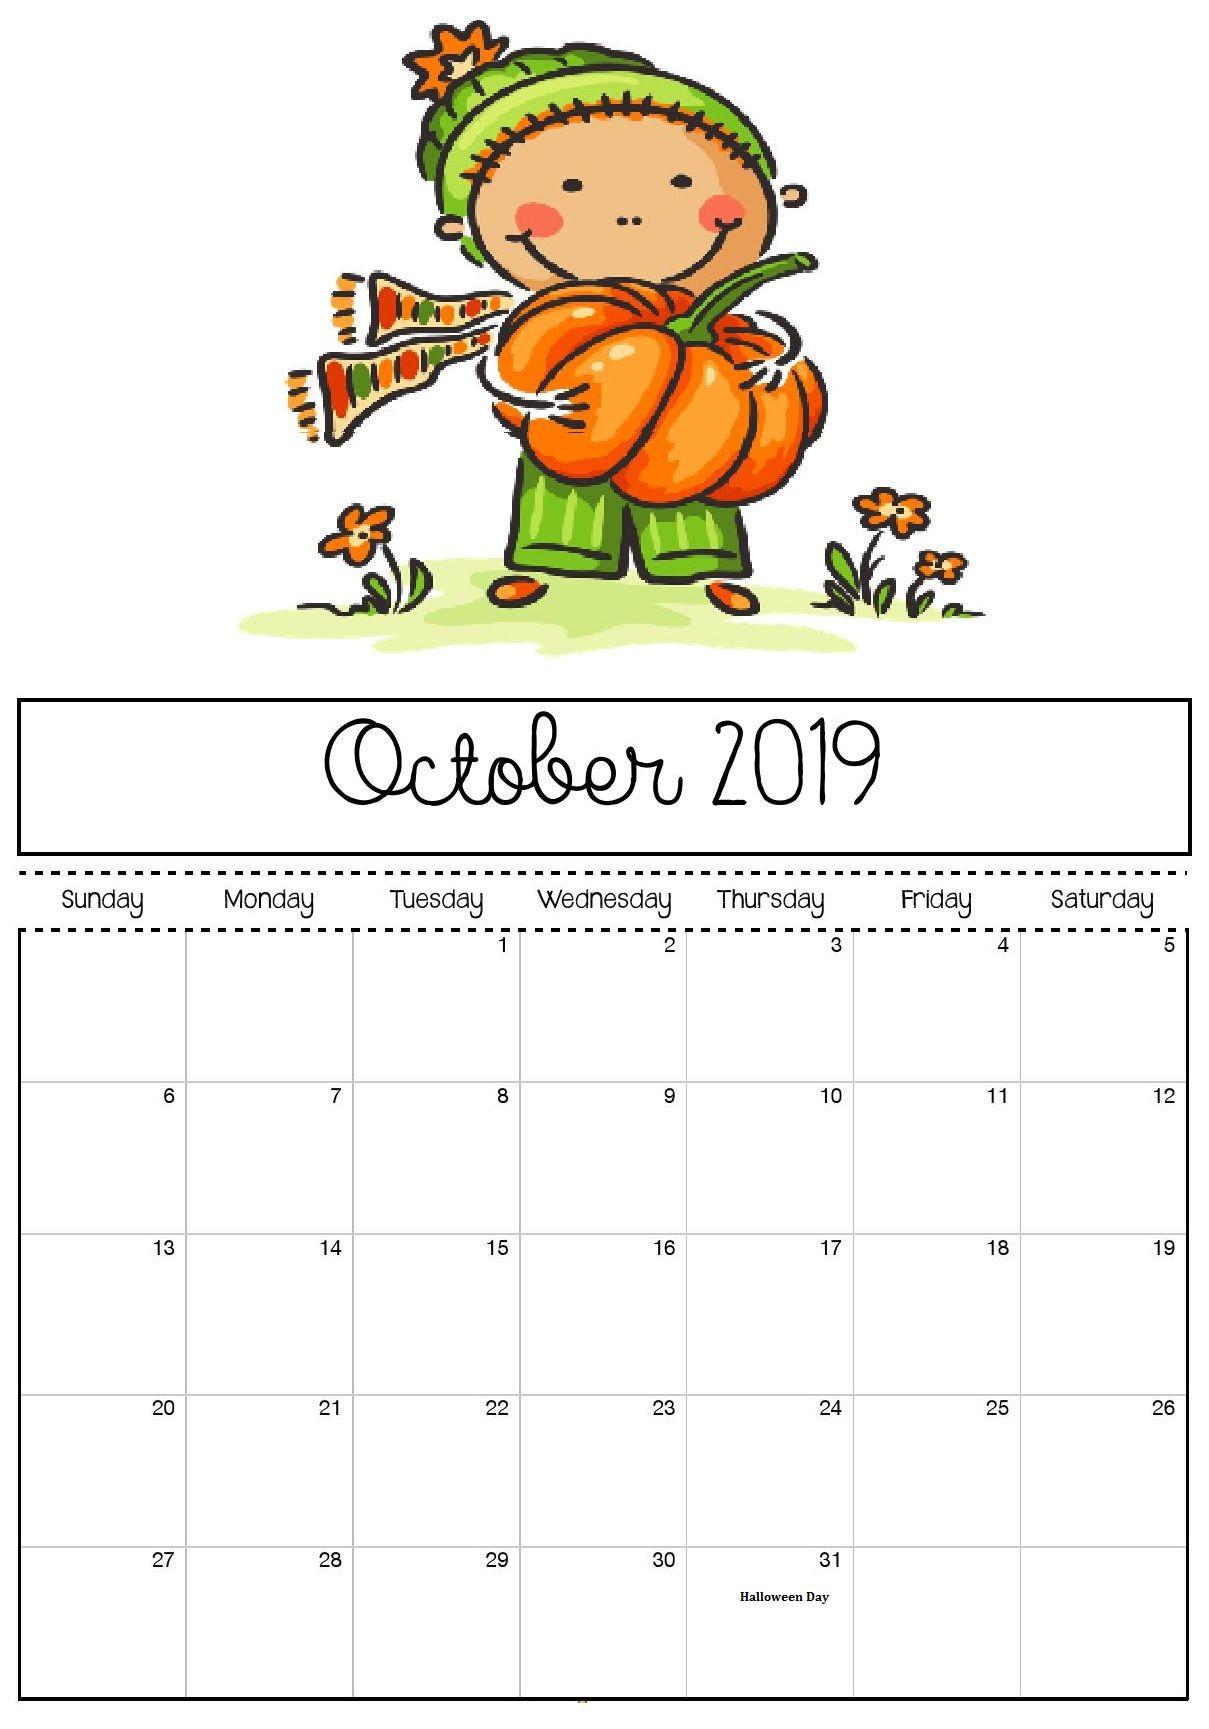 October 2019 Calendar Cute For Kids